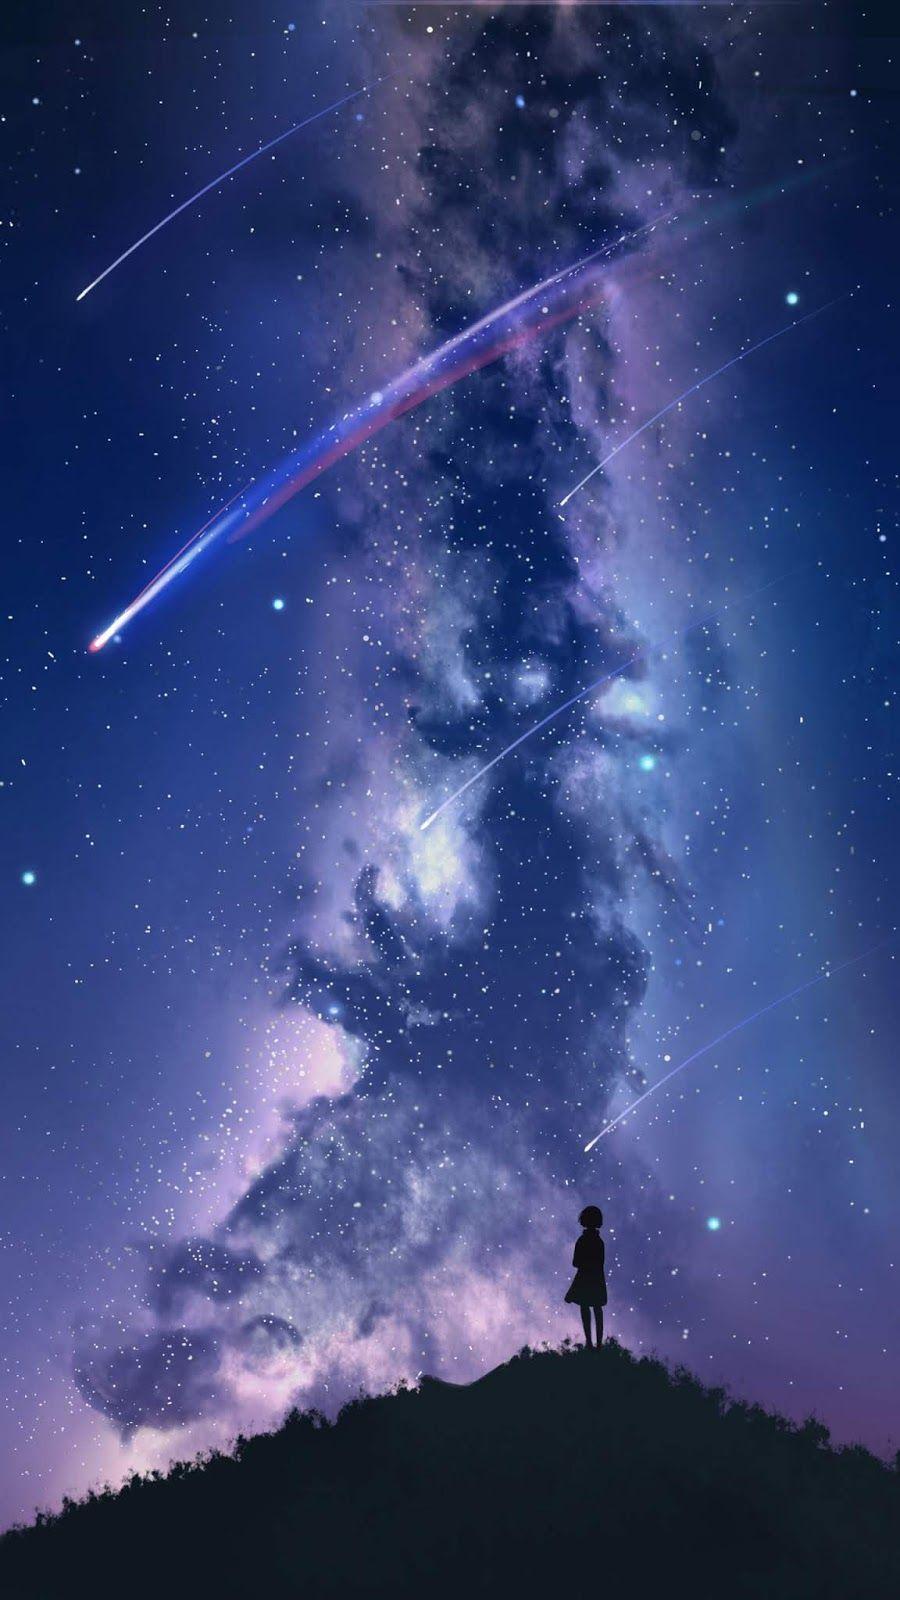 Watching The Star Fall Anime Scenery Galaxy Wallpaper Night Sky Wallpaper